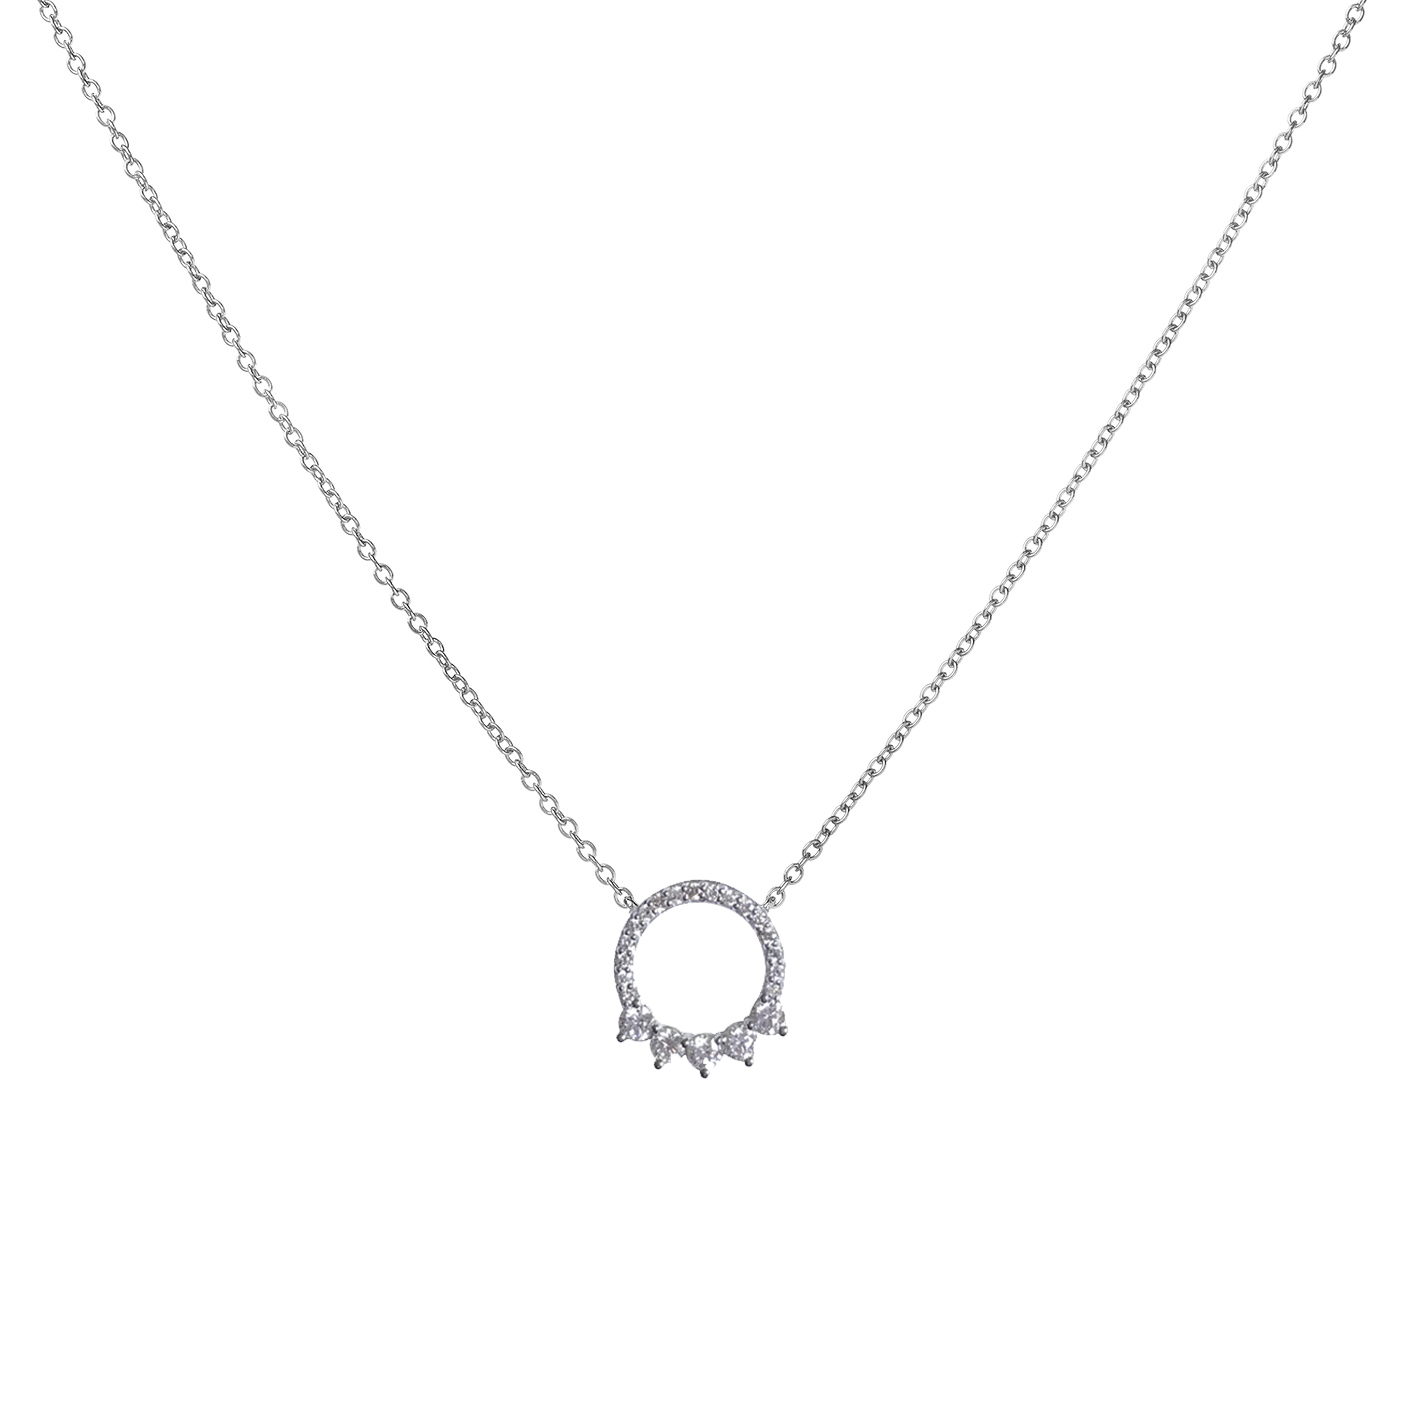 Sensi joyas jewellery Granada silver engagementDIAMONDS PENDANT  ( 42 cm )